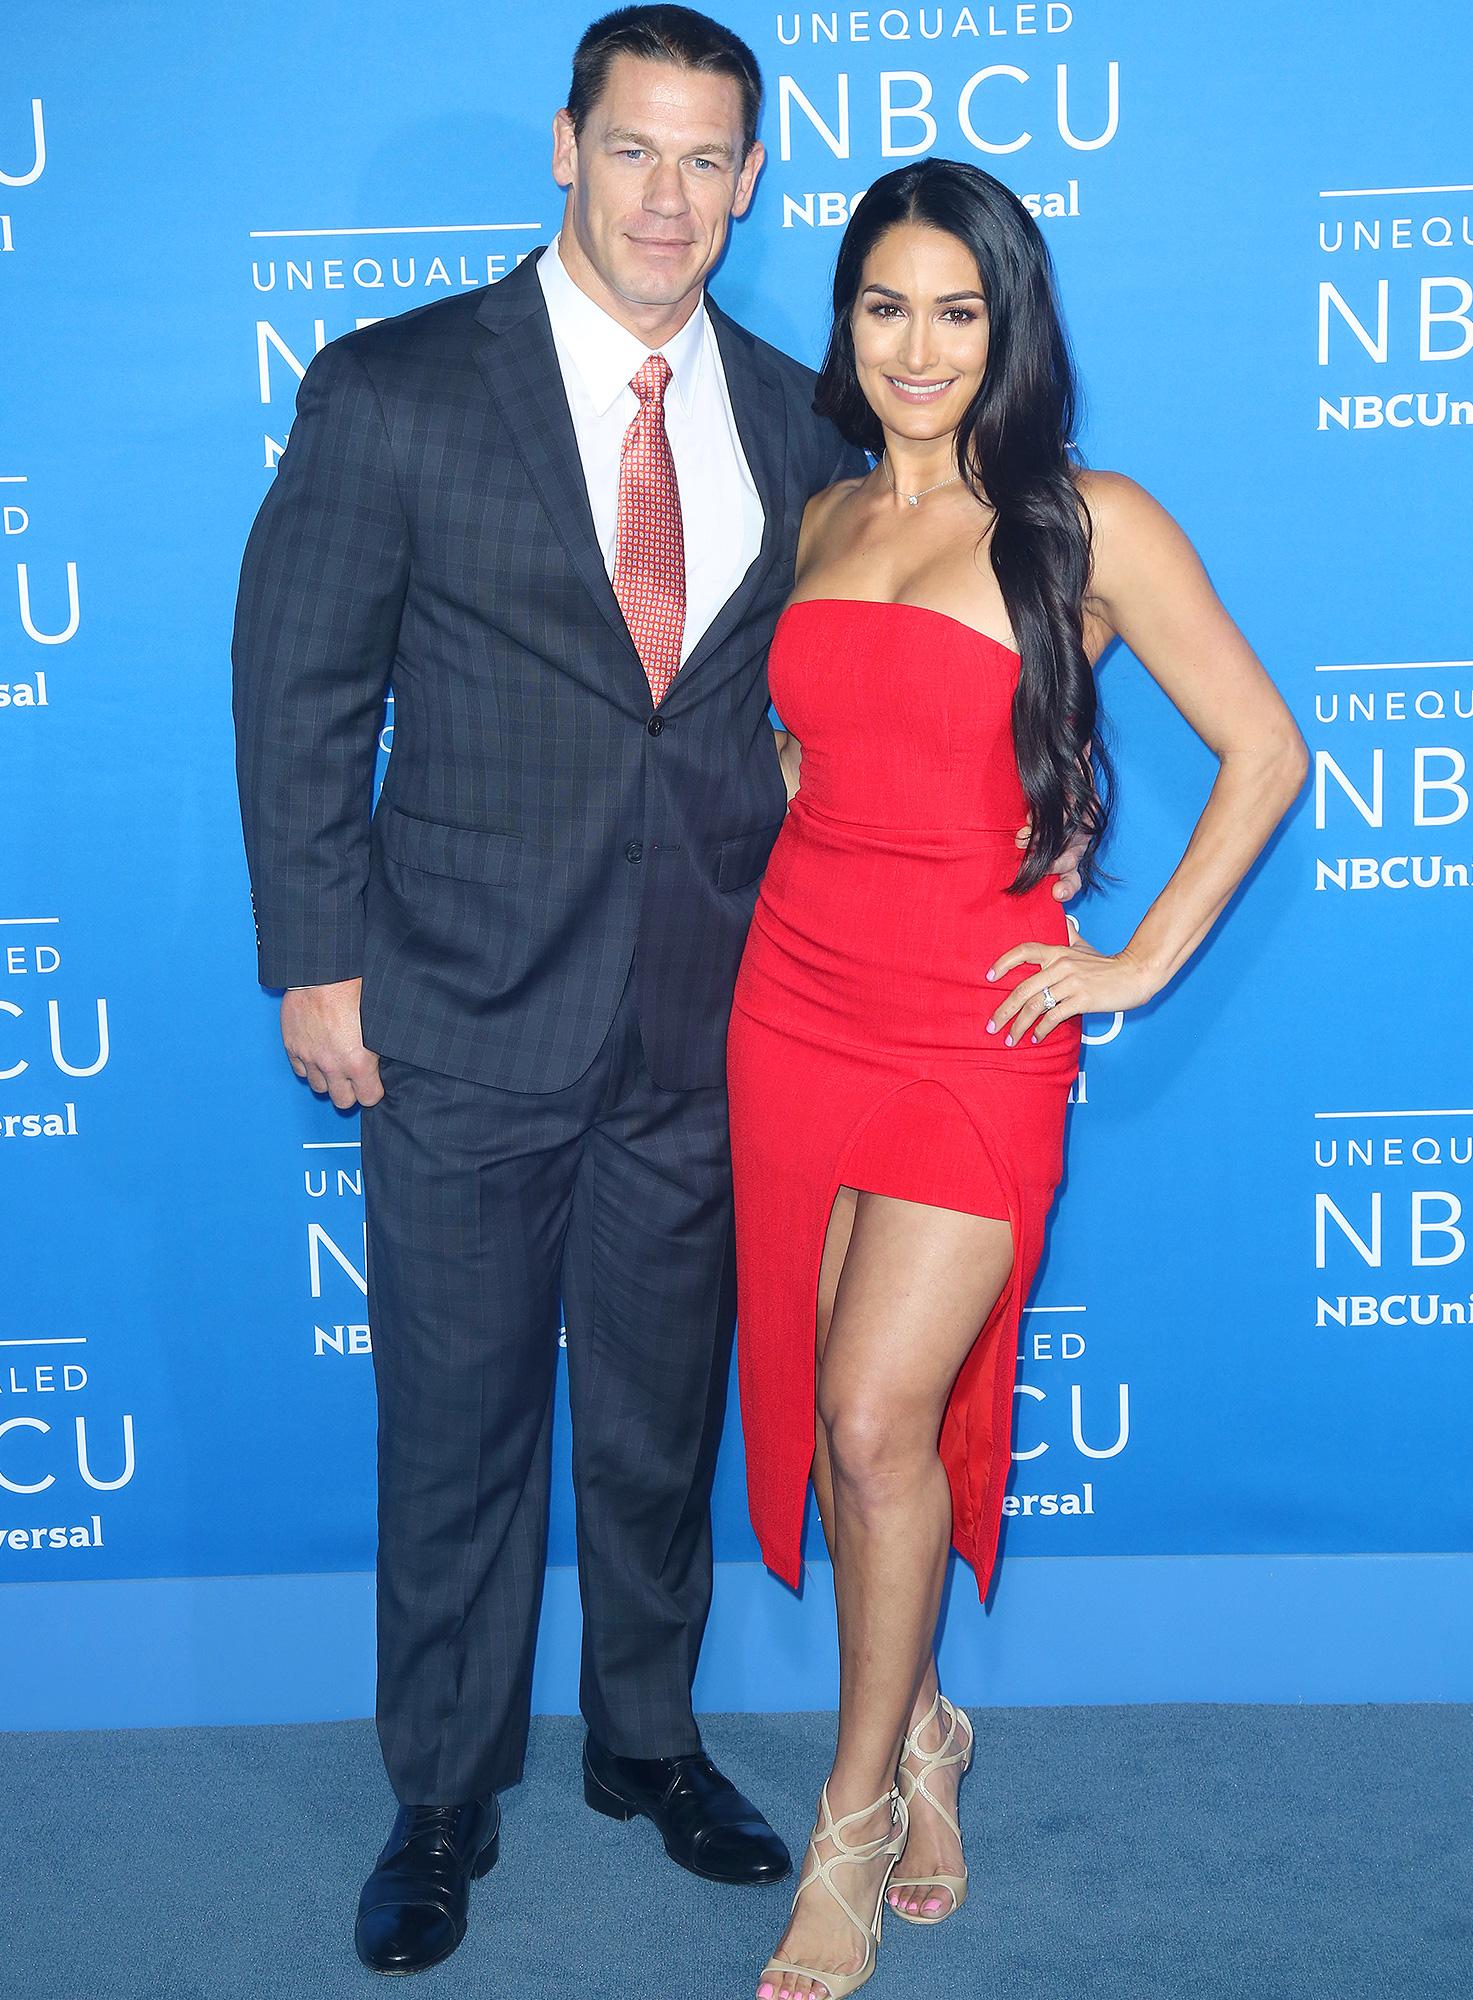 John Cena and Nikki Bella: Latest Updates and Photos – ZIG